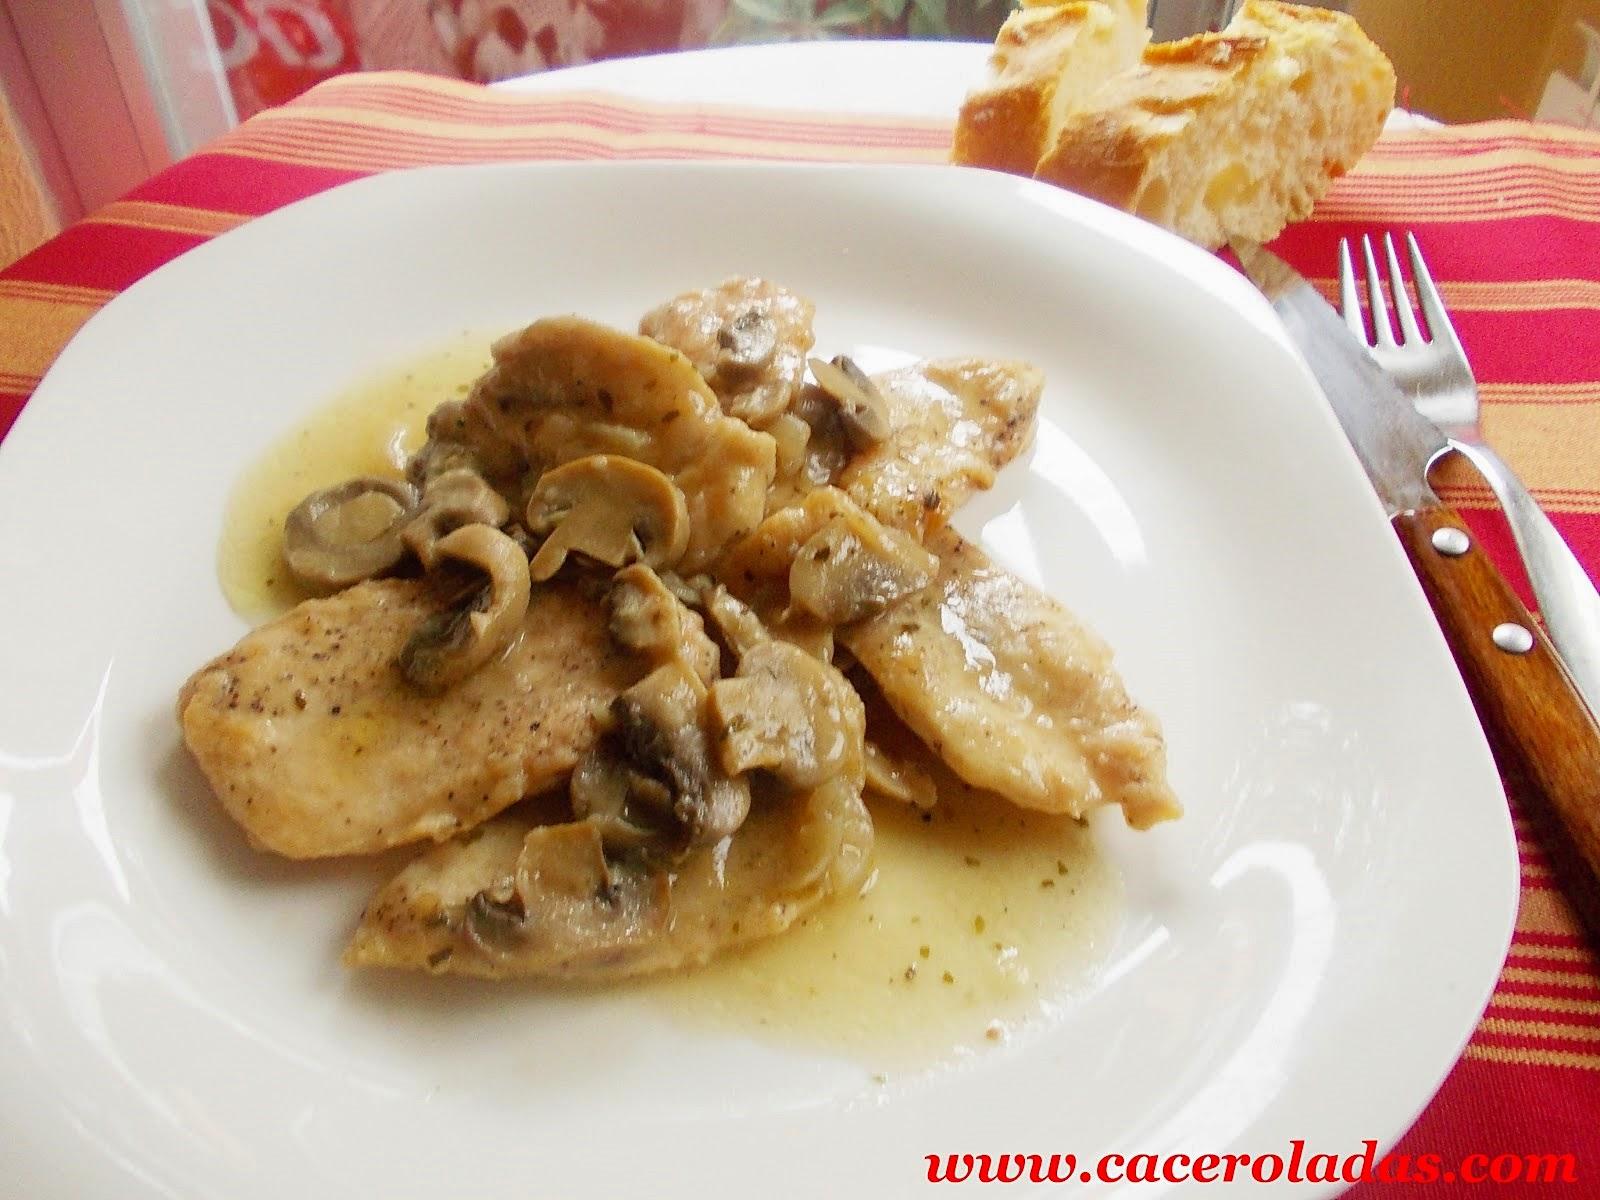 filetes de pollo en salsa con champiñones